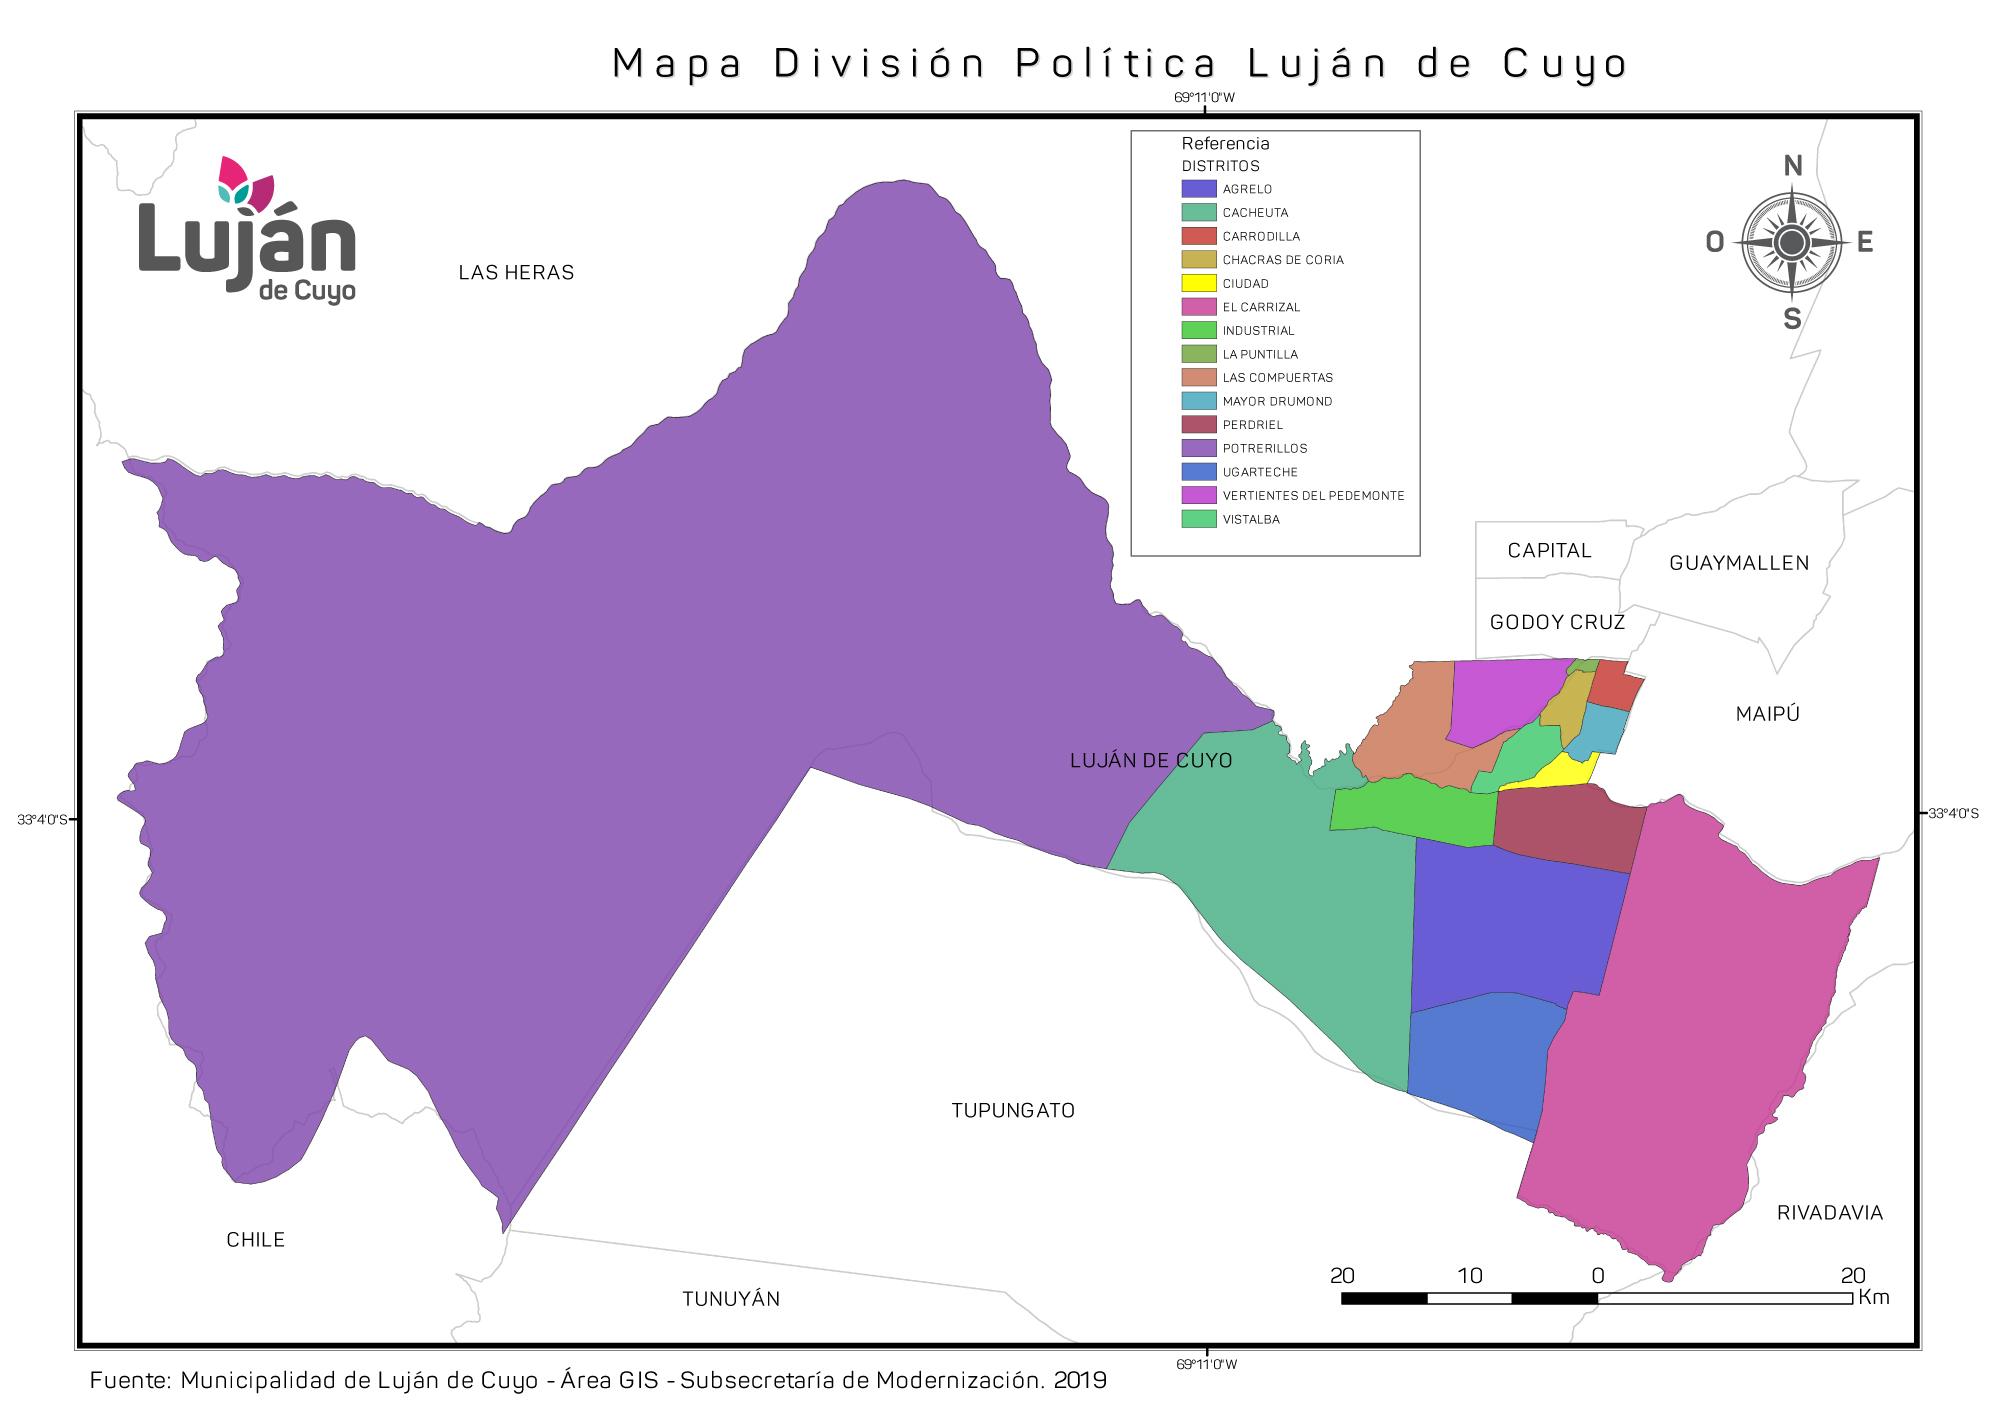 Mapa Politico